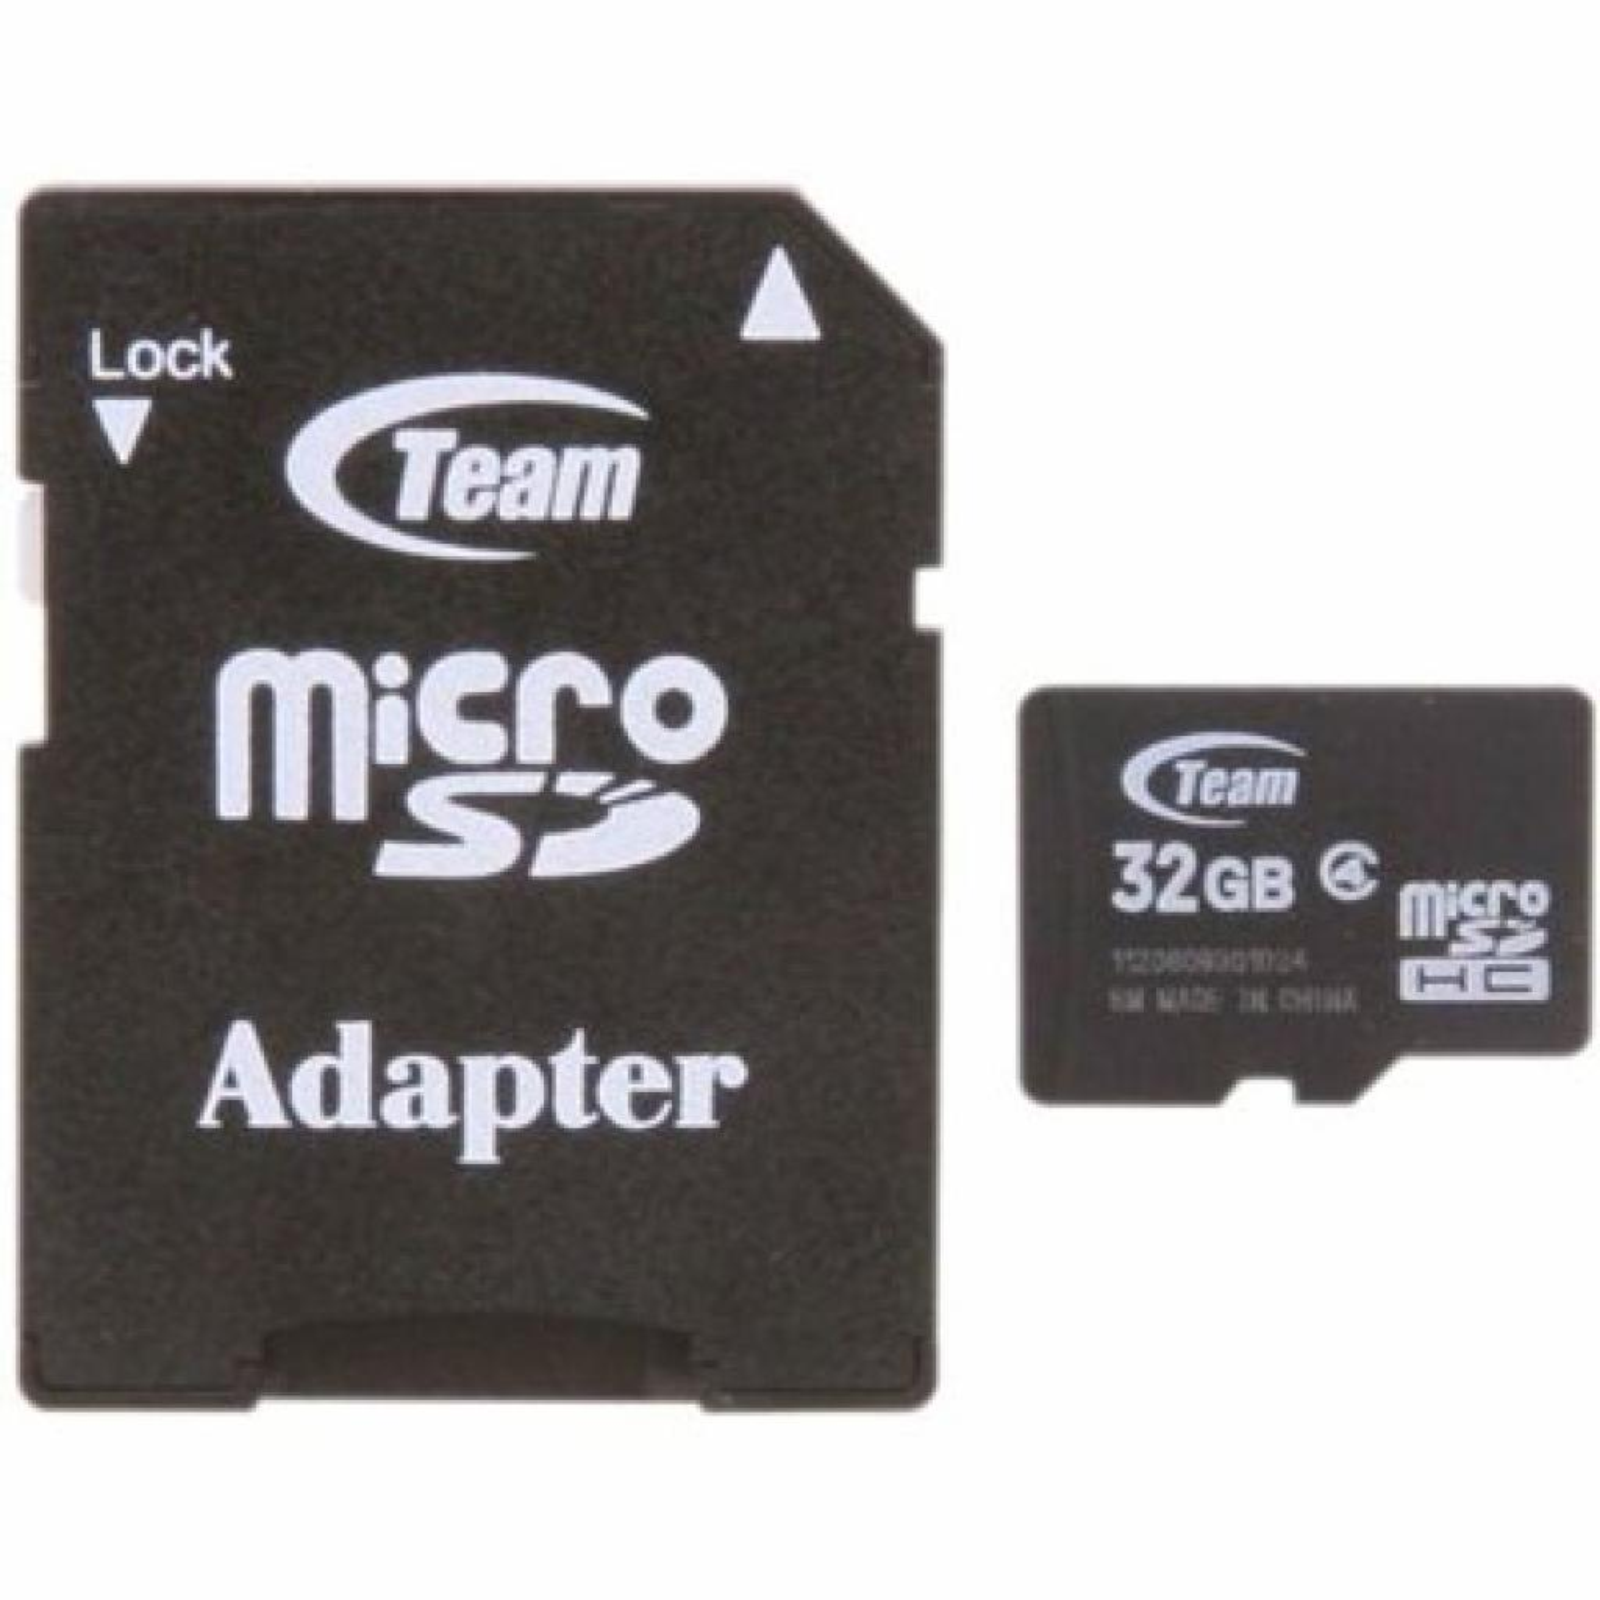 Карта памяти Team 32Gb microSDHC class 4 (TUSDH32GCL403 / TG032G0MC24A)